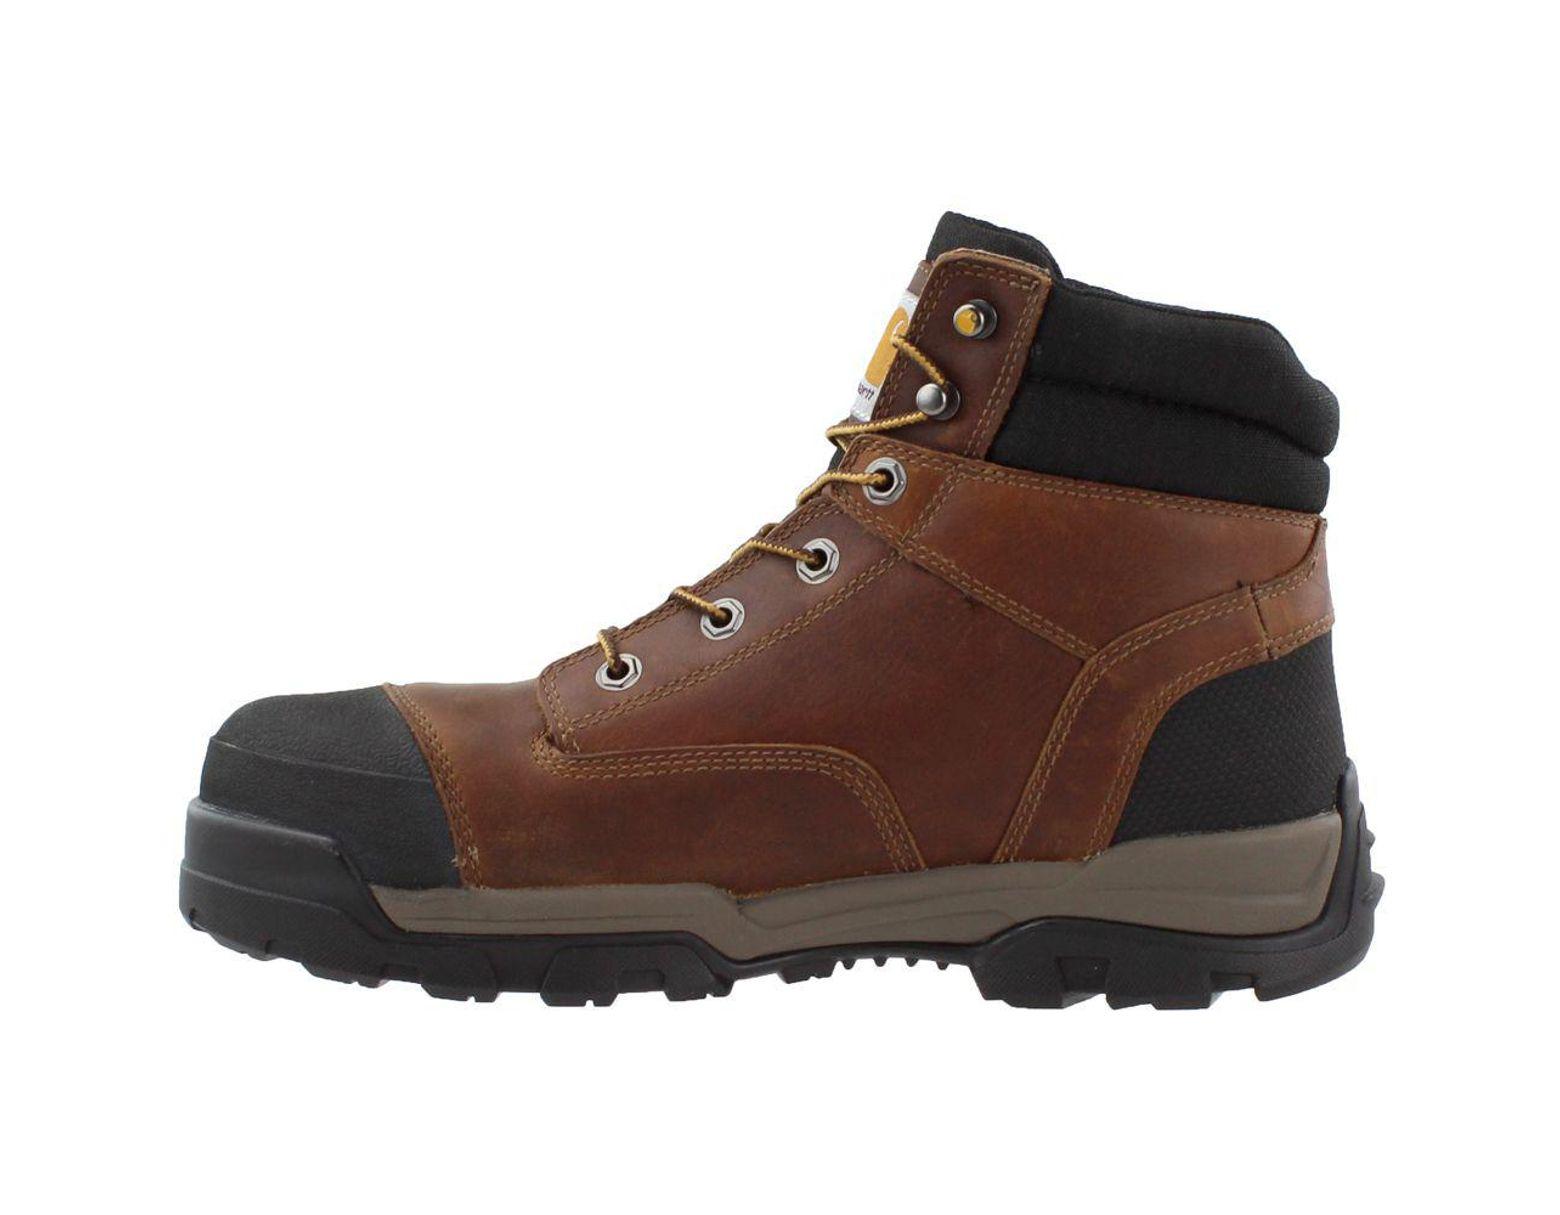 fde96e4900e Men's Work & Utility Footwear Carhartt Mens 6 Energy Black ...